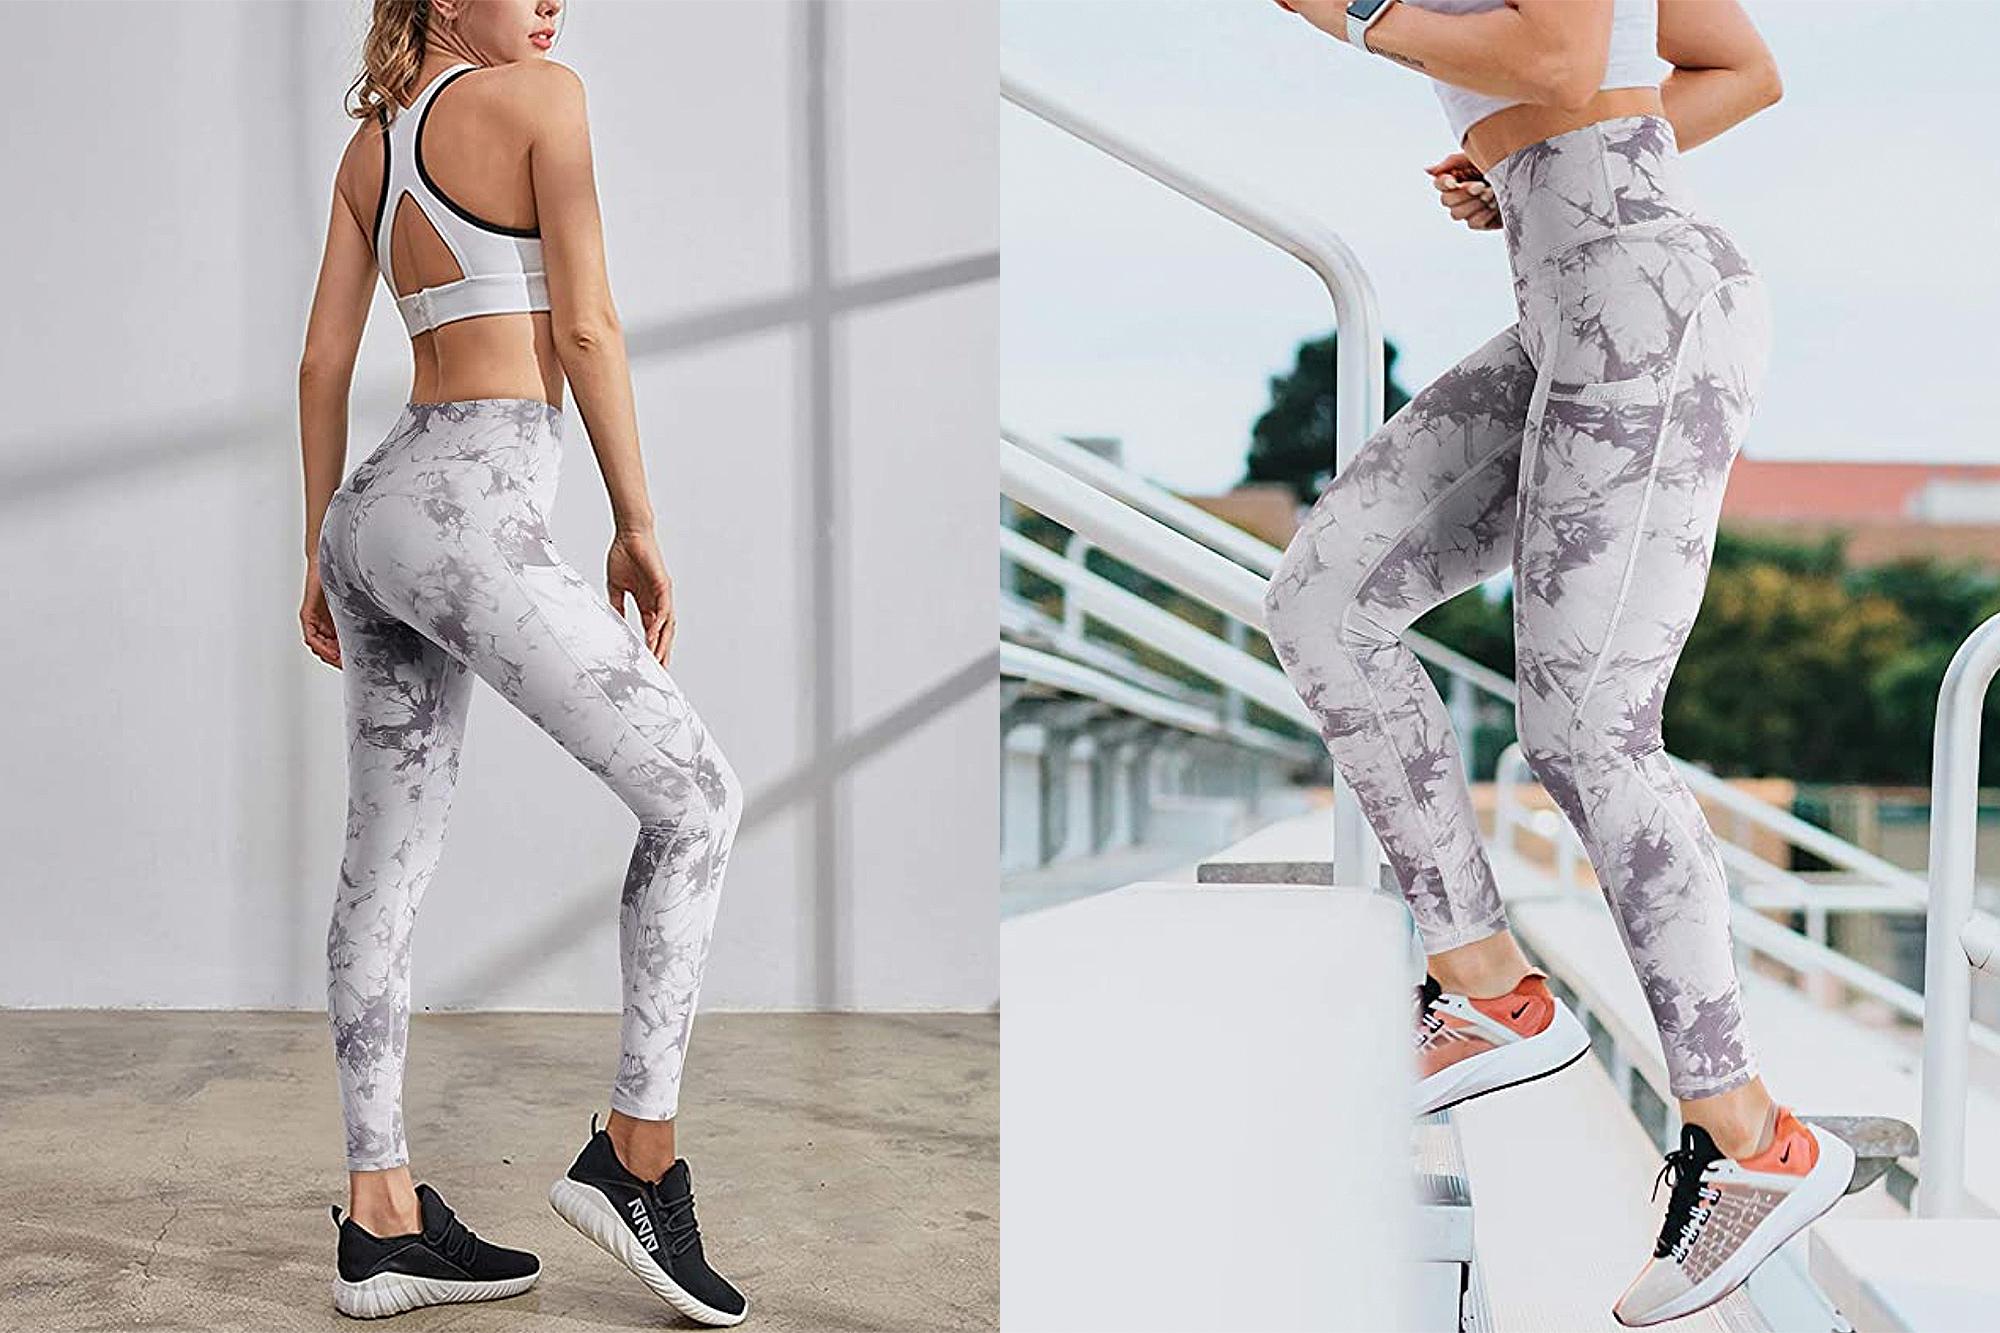 G4Free High Waist Yoga Pants with Pockets